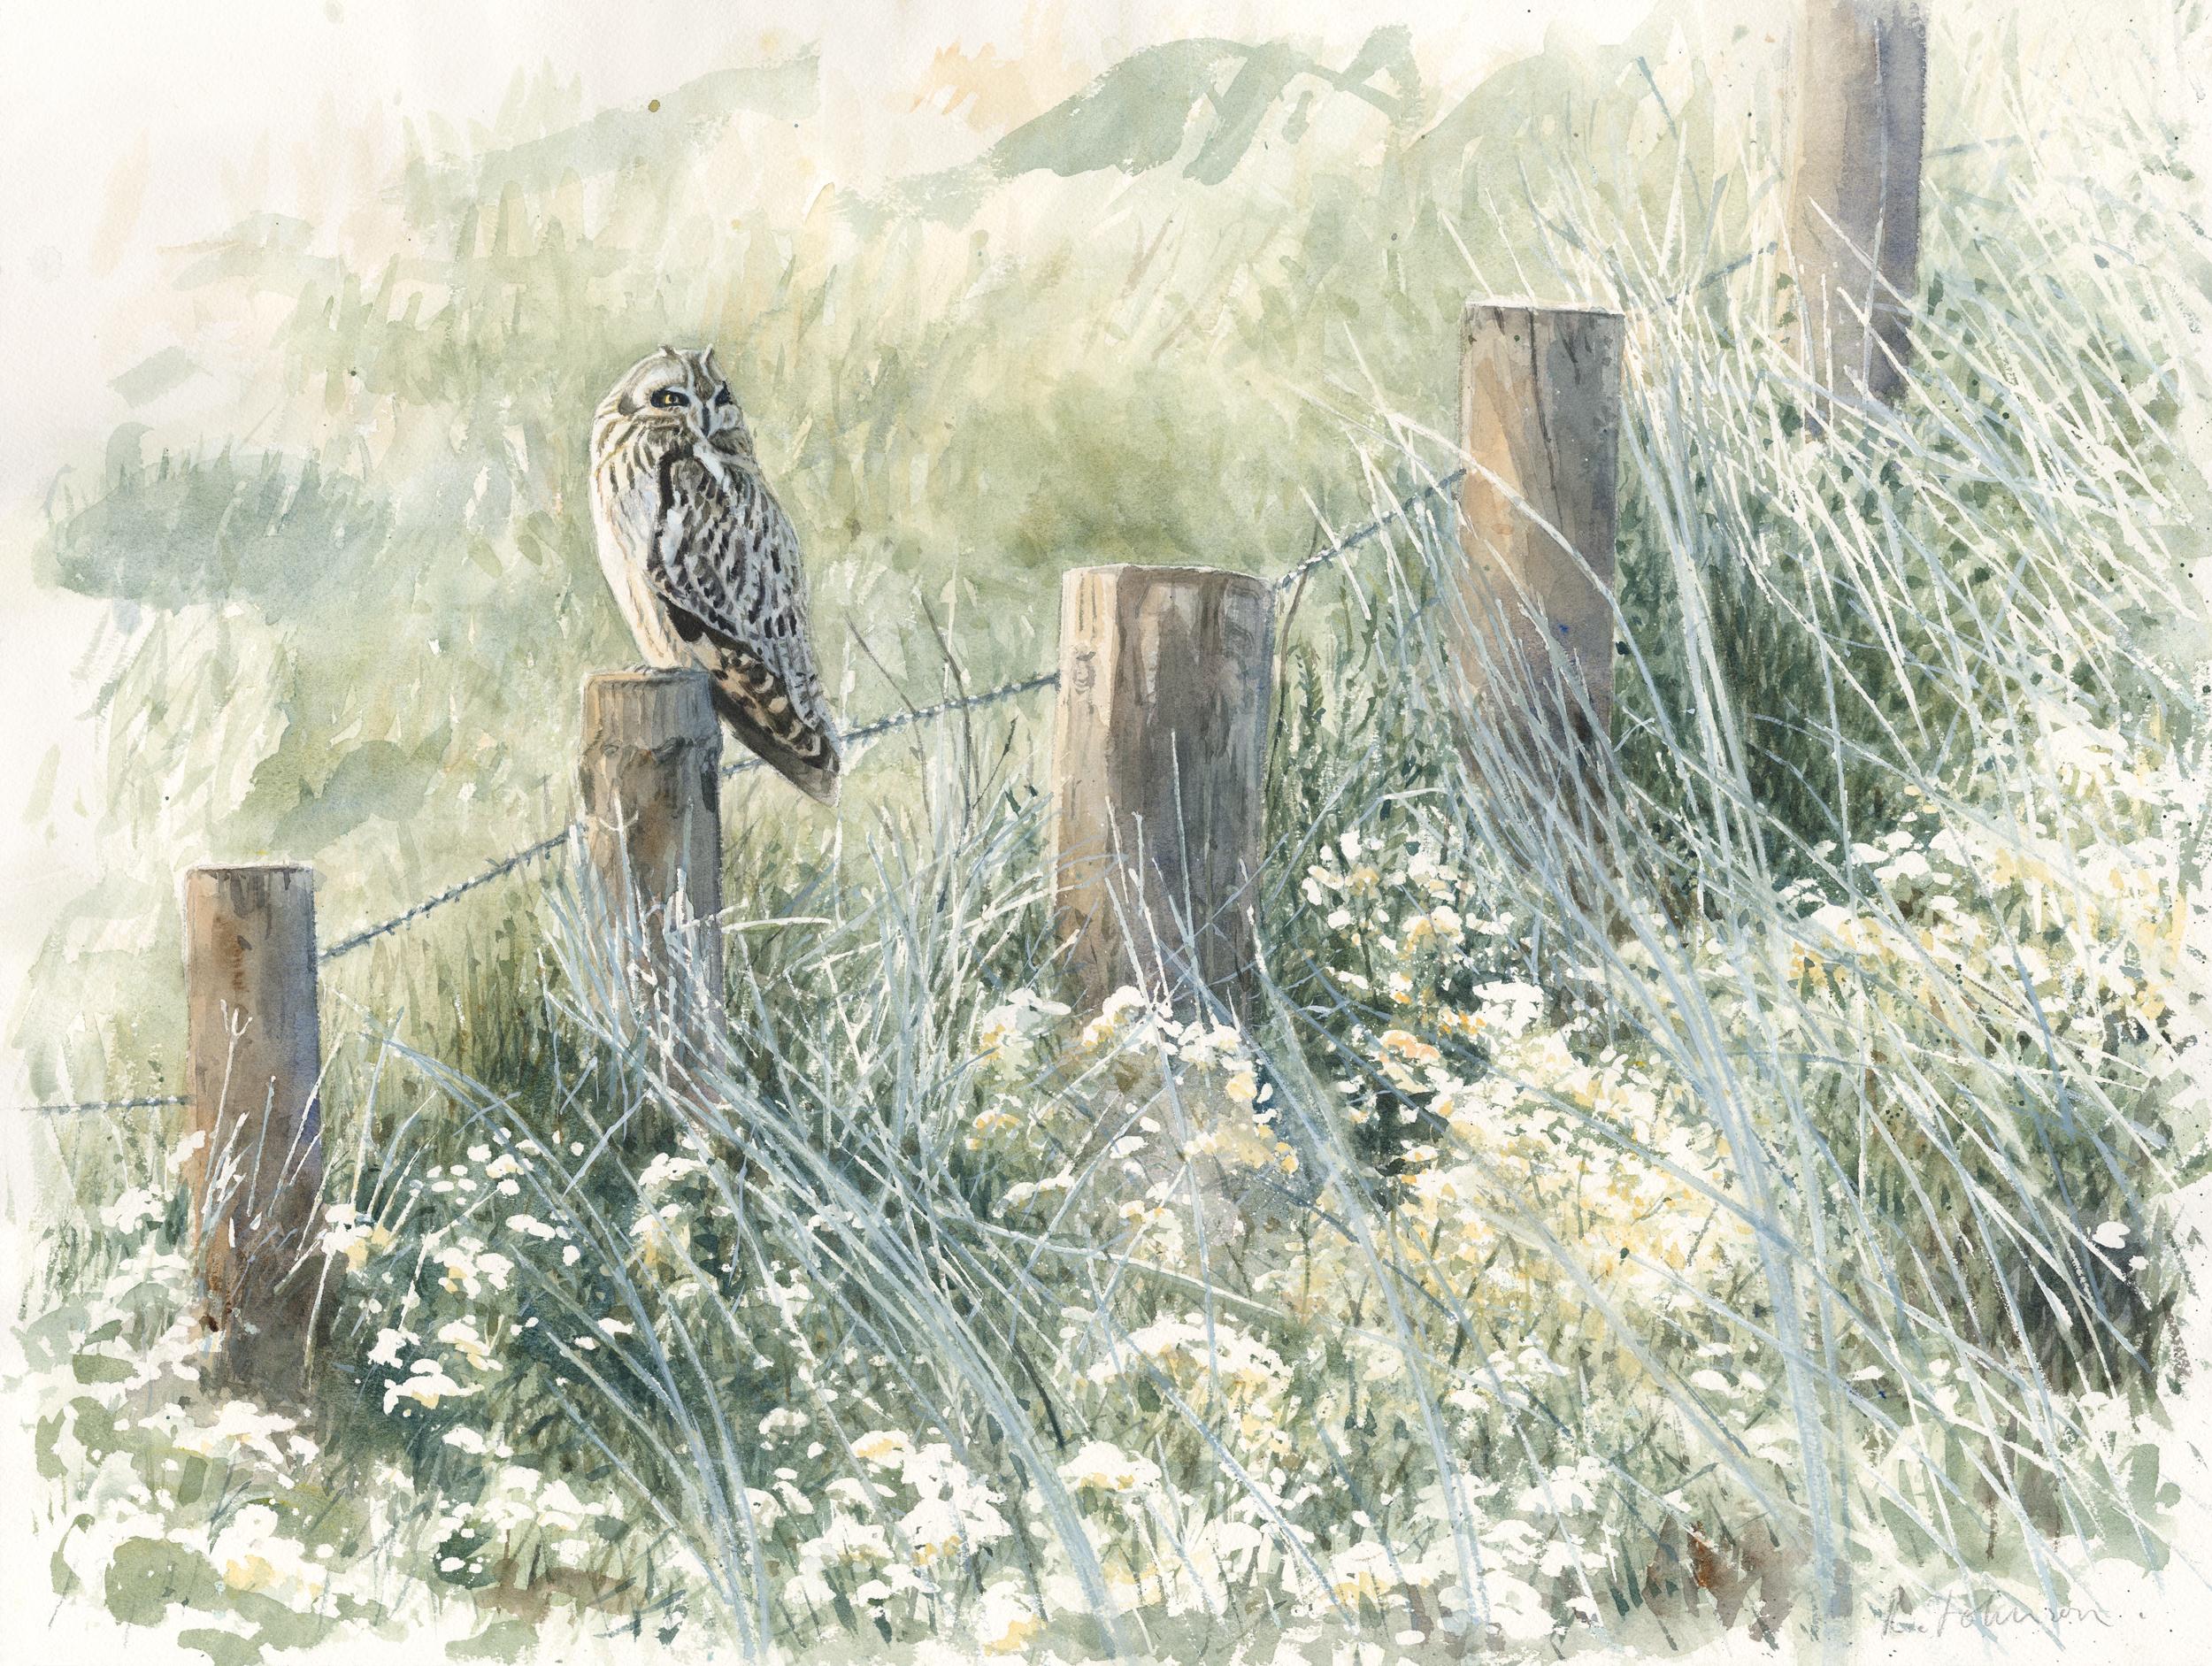 Short-eared Owl, Burwell Fen, Watercolour, 63 x 79 cm